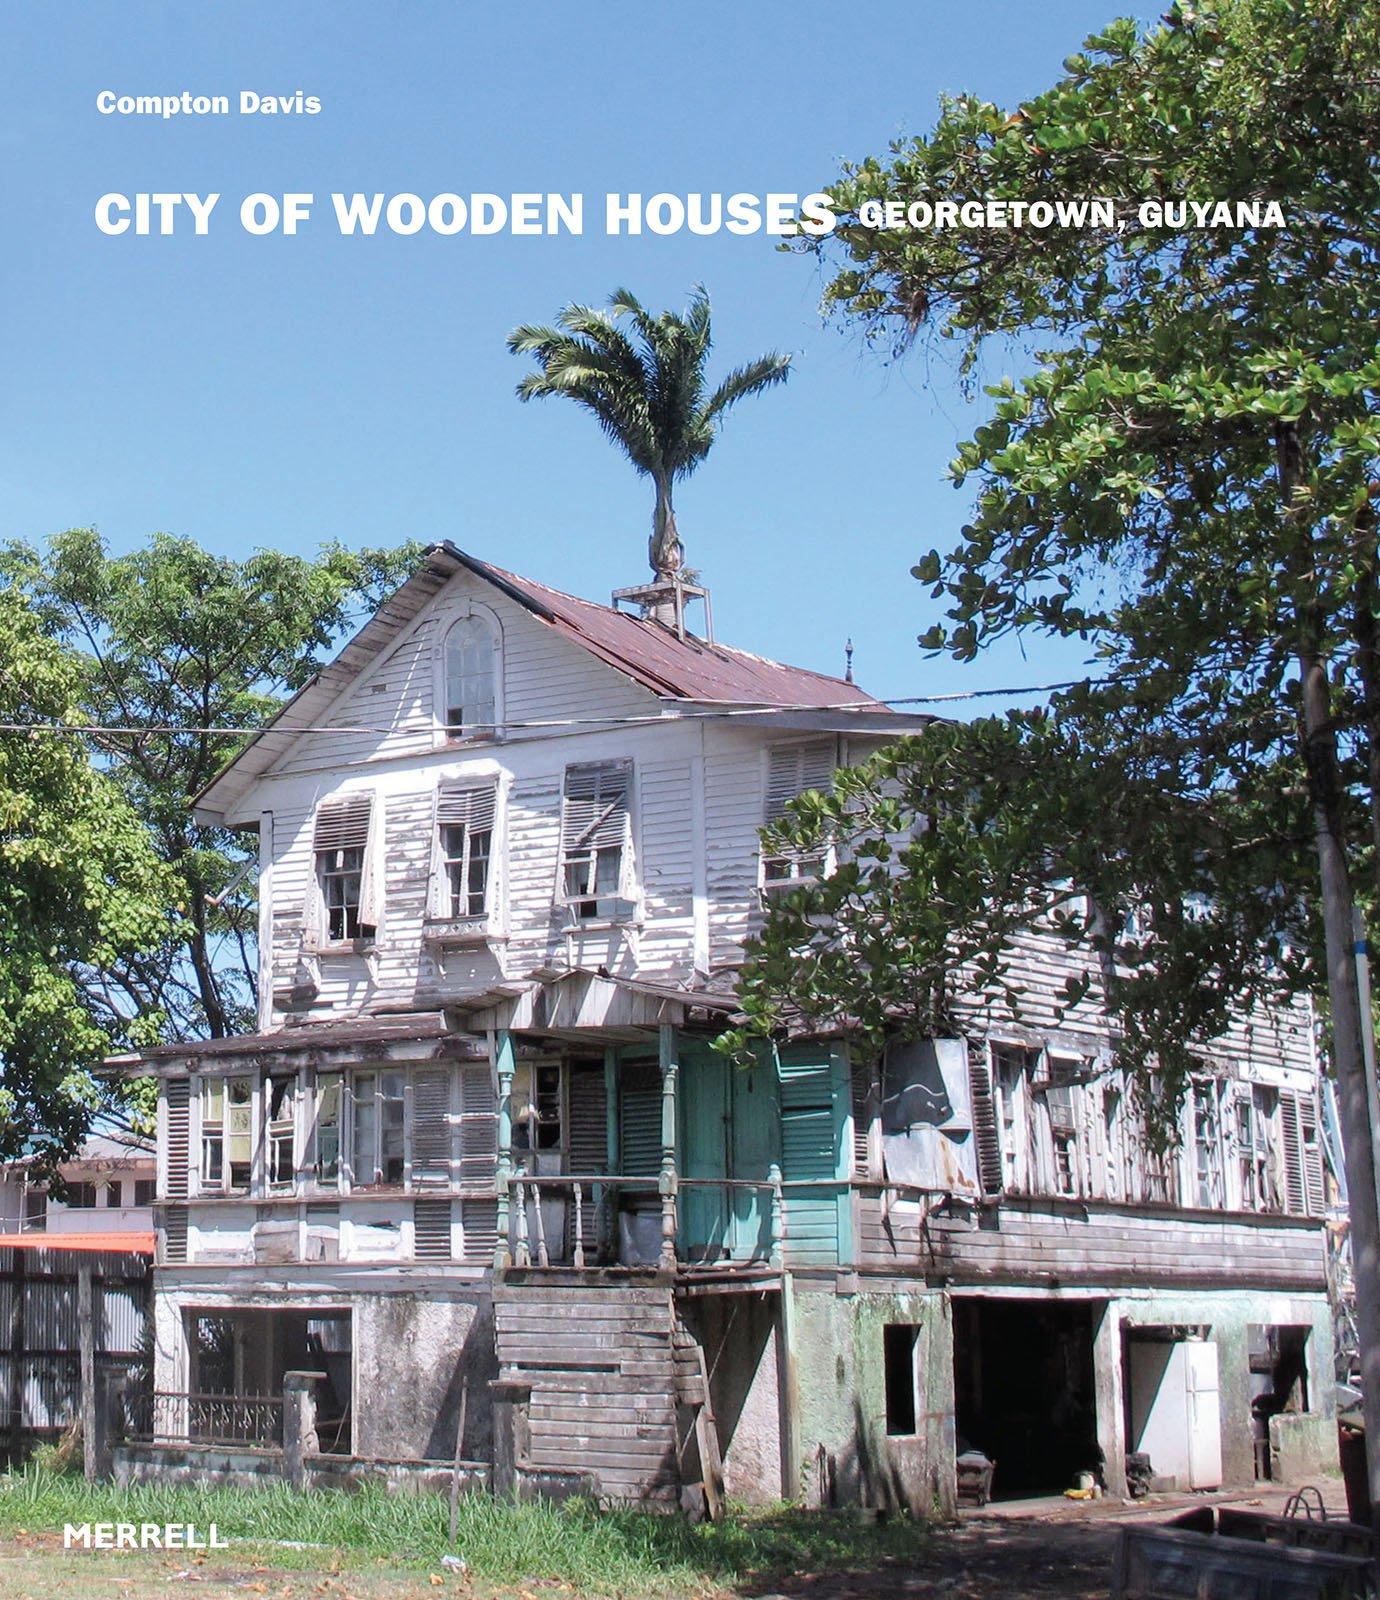 city of wooden houses georgetown guyana mr compton davis